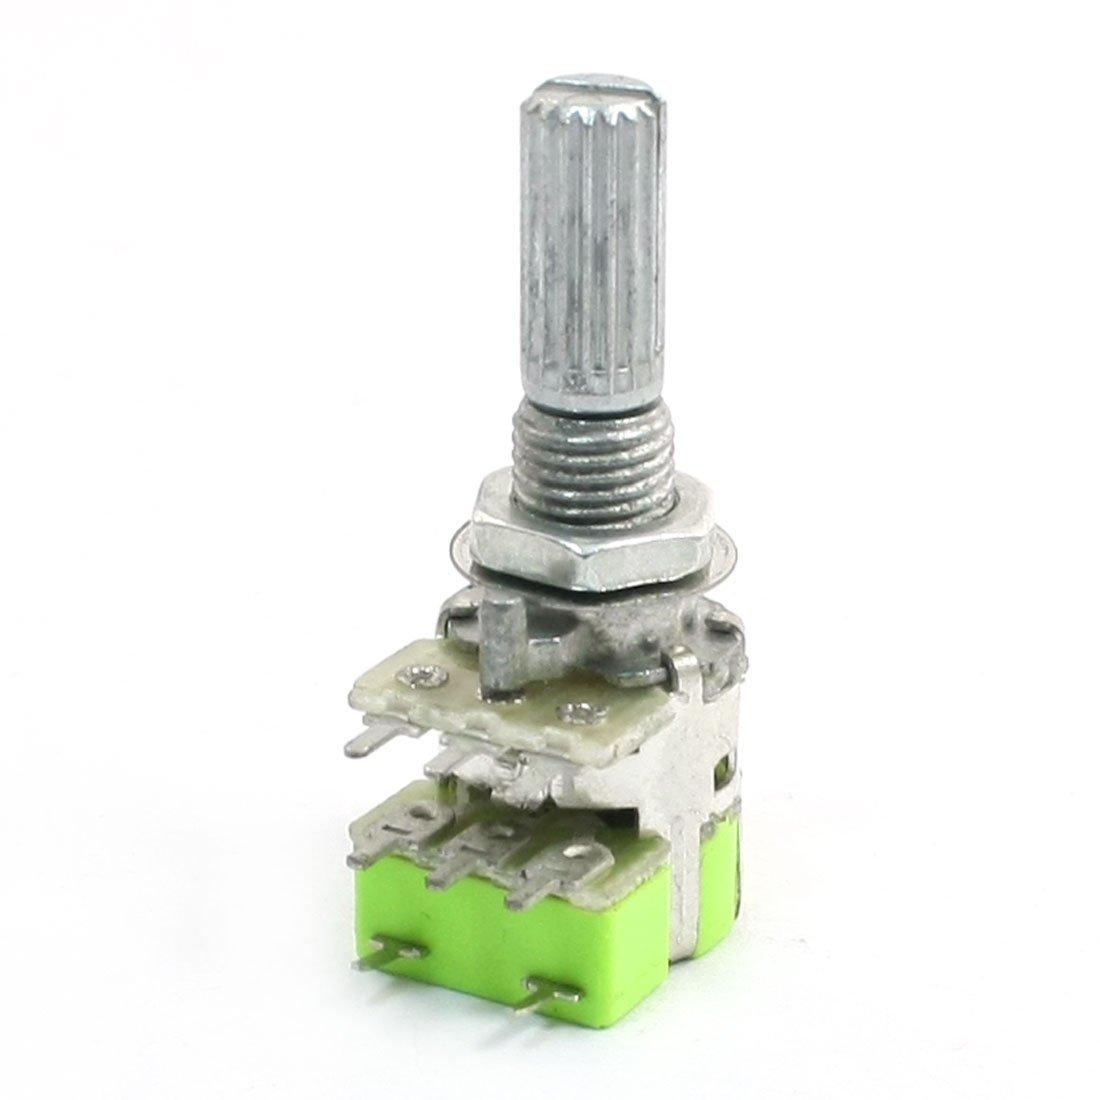 High Quality B50K 50K Ohm Dual Linear Taper Volume Control Potentiometer Switch